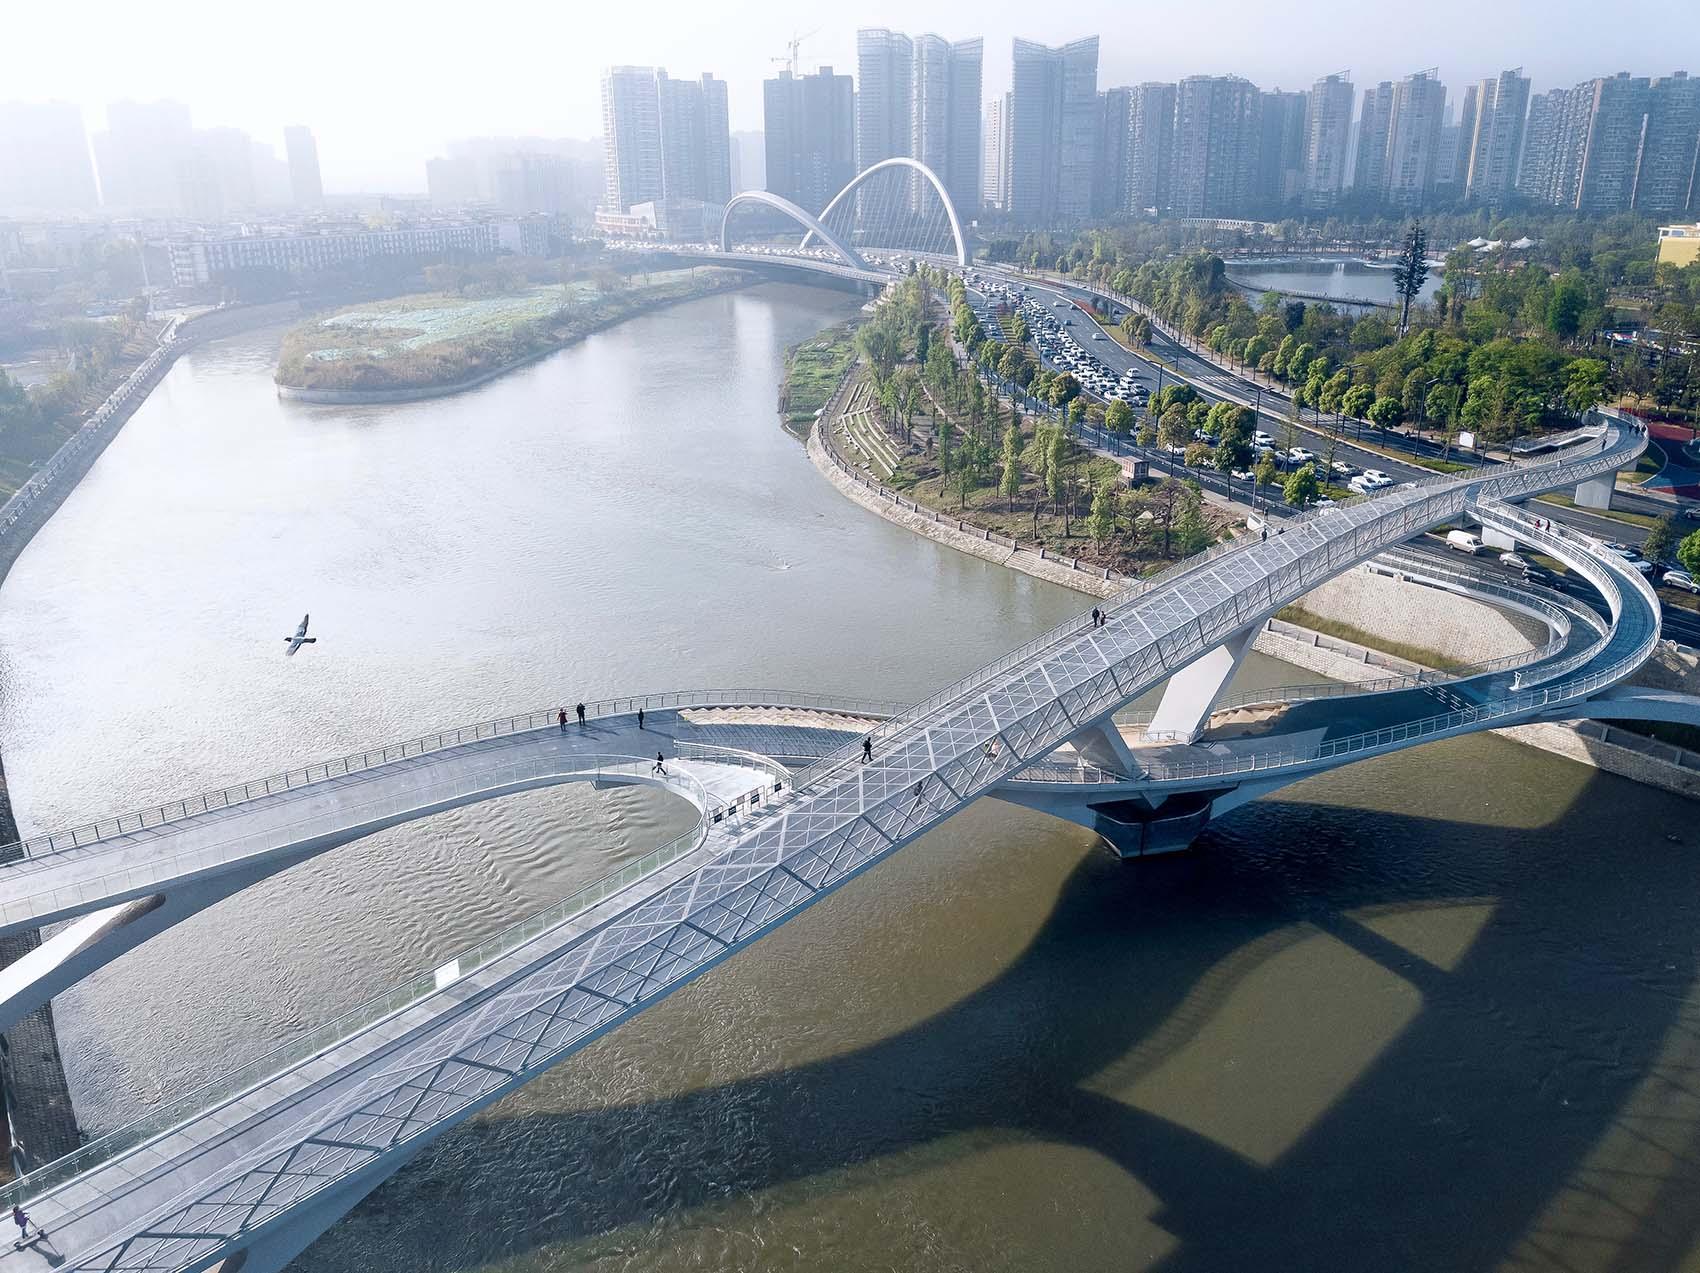 Daylight Arial Shot 五岔子大橋 - Wuchazi Bridge (INFINITE LOOP)